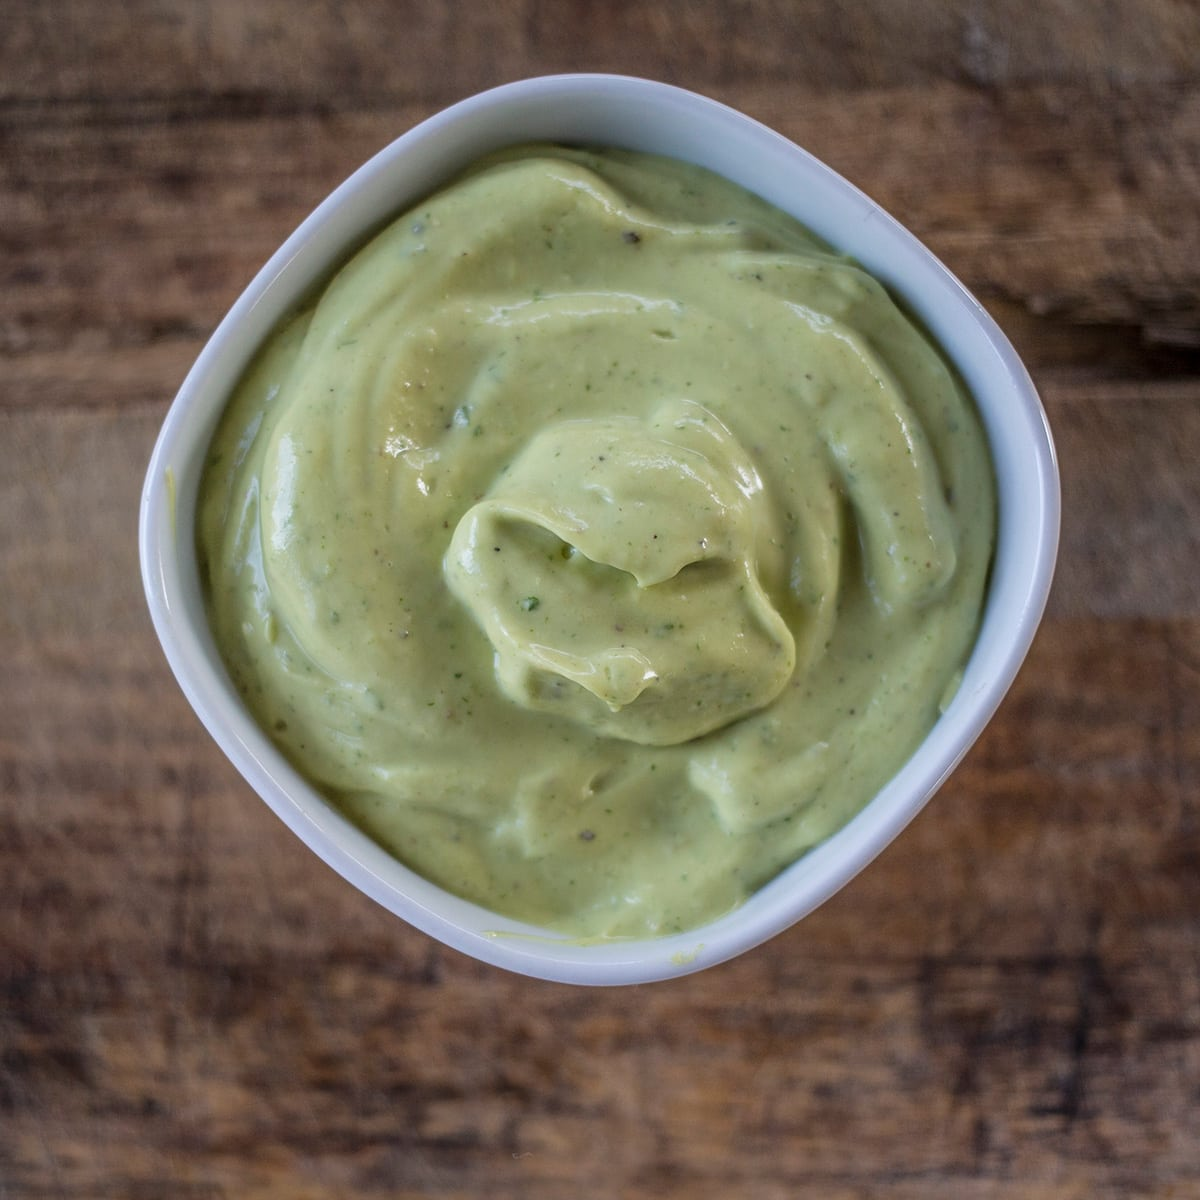 Avocado sauce in white bowl on wooden backrgound.